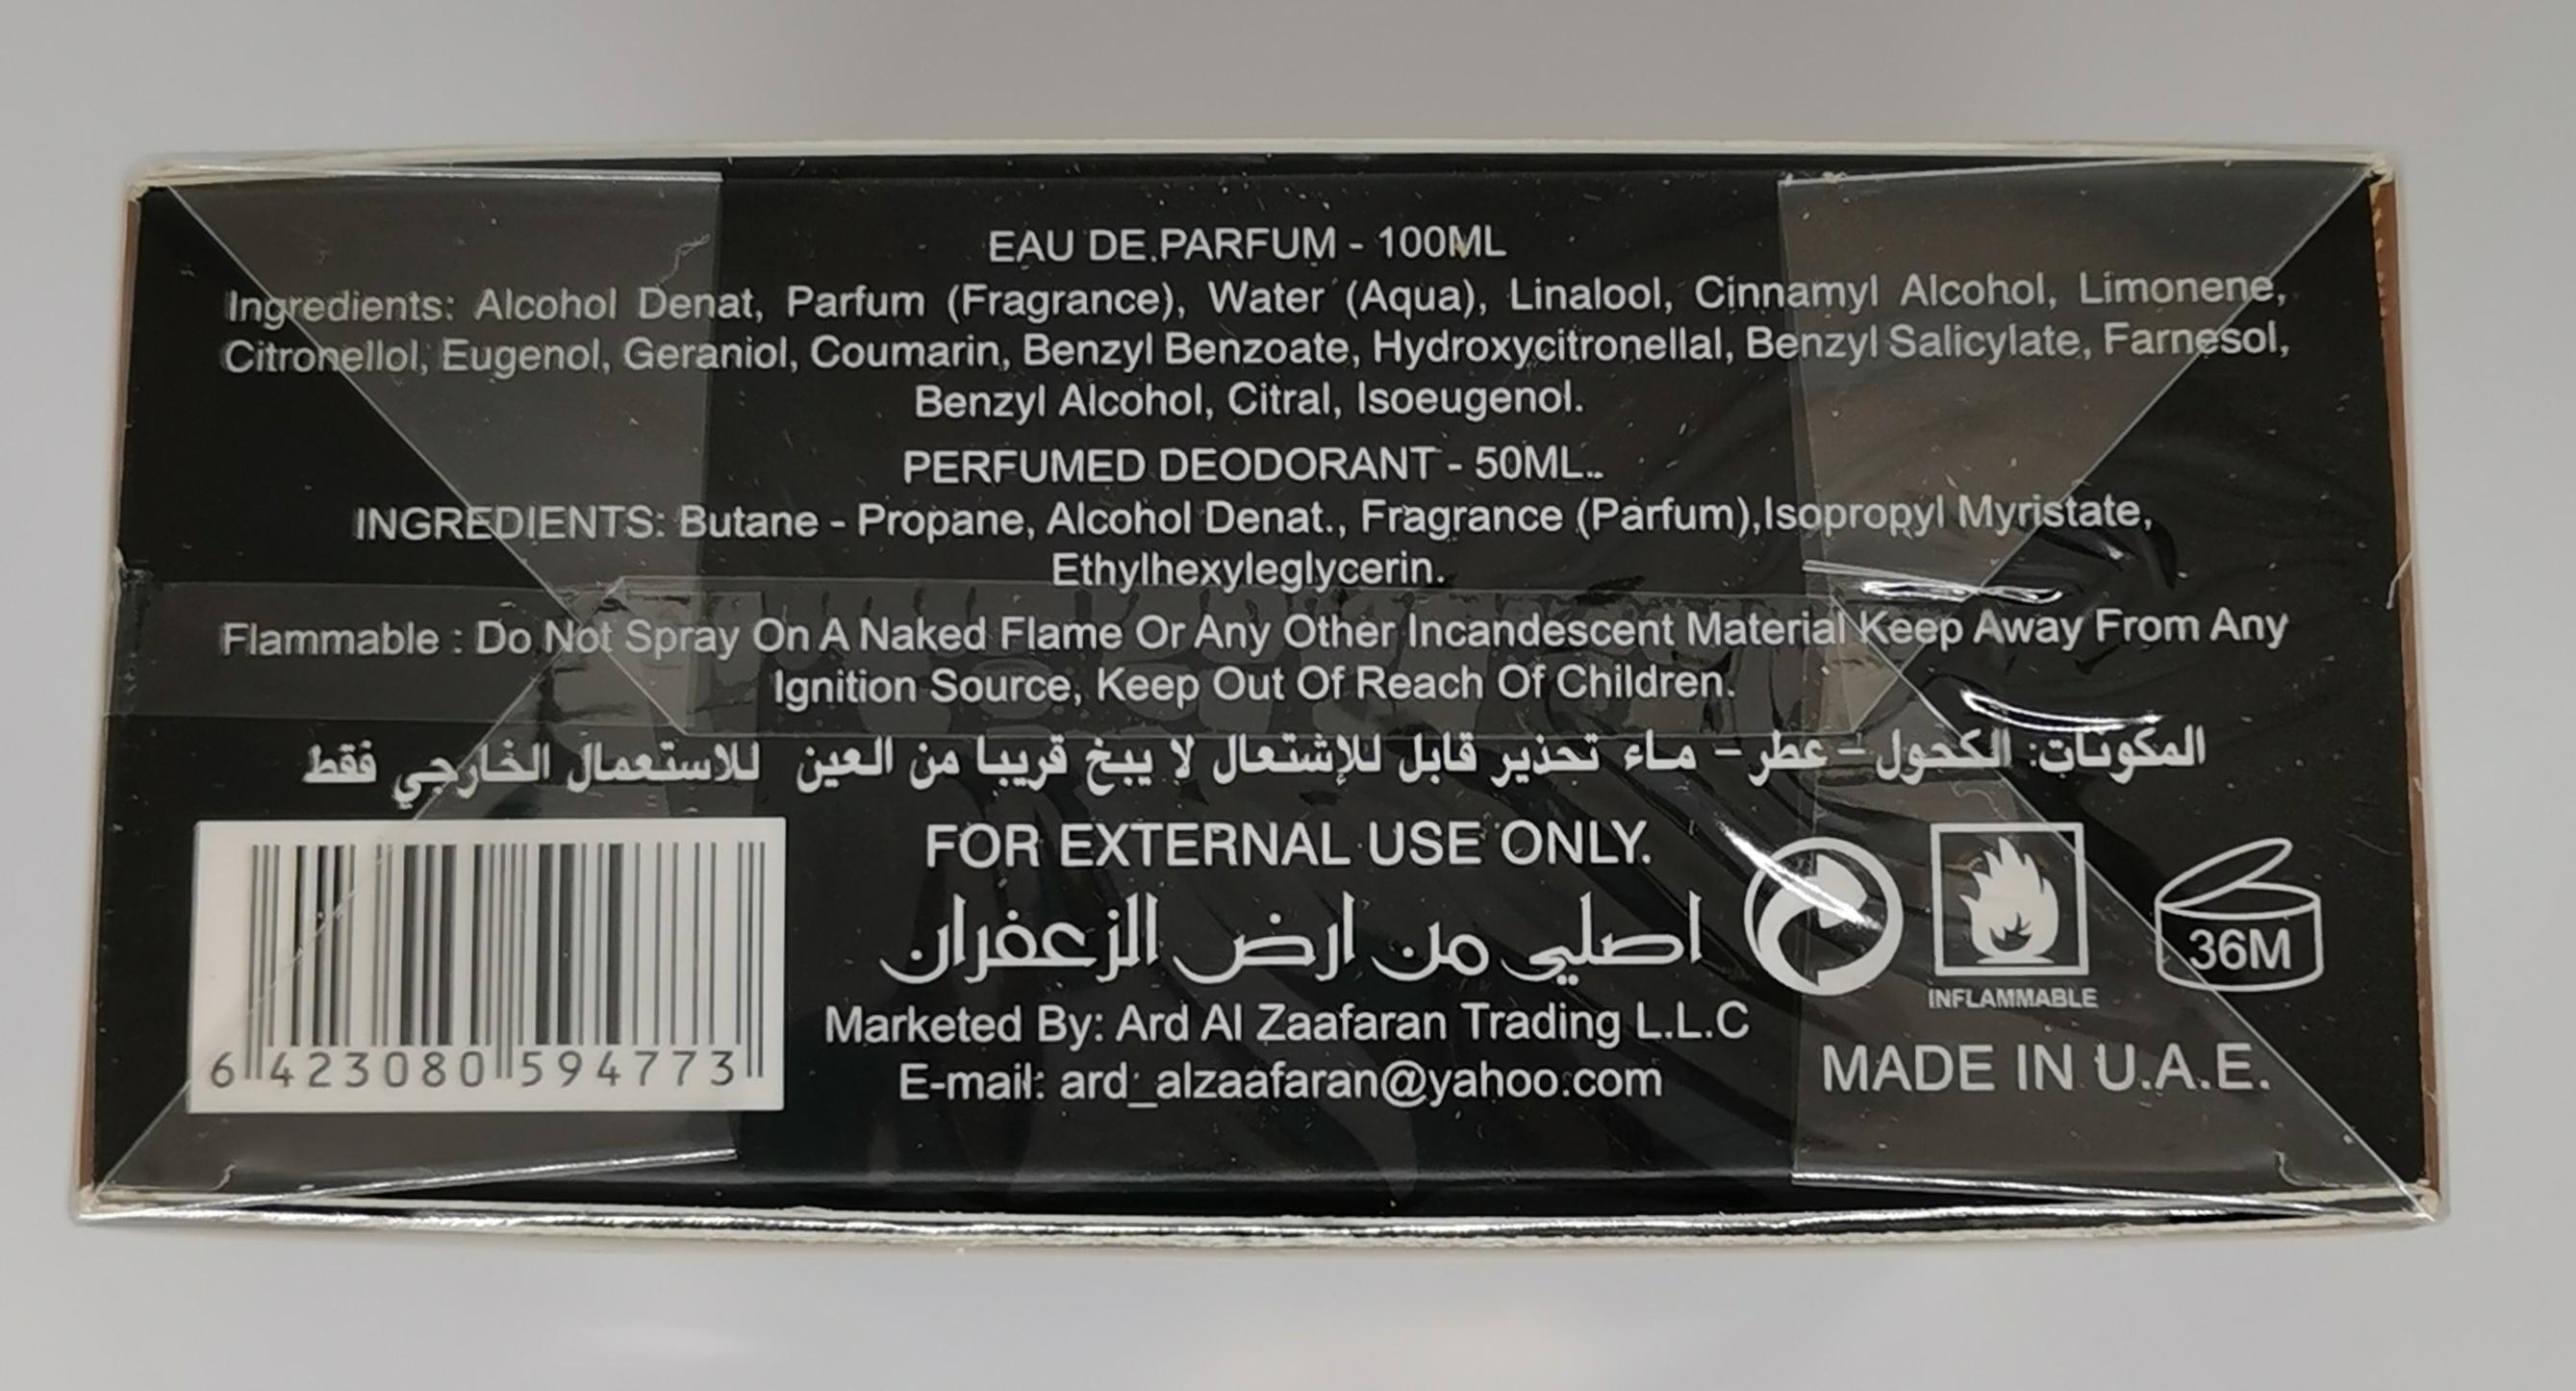 Парфюмерная вода 100 мл Ard Al Zaafaran Oud 24 Hours - фото штрих-кода на коробке